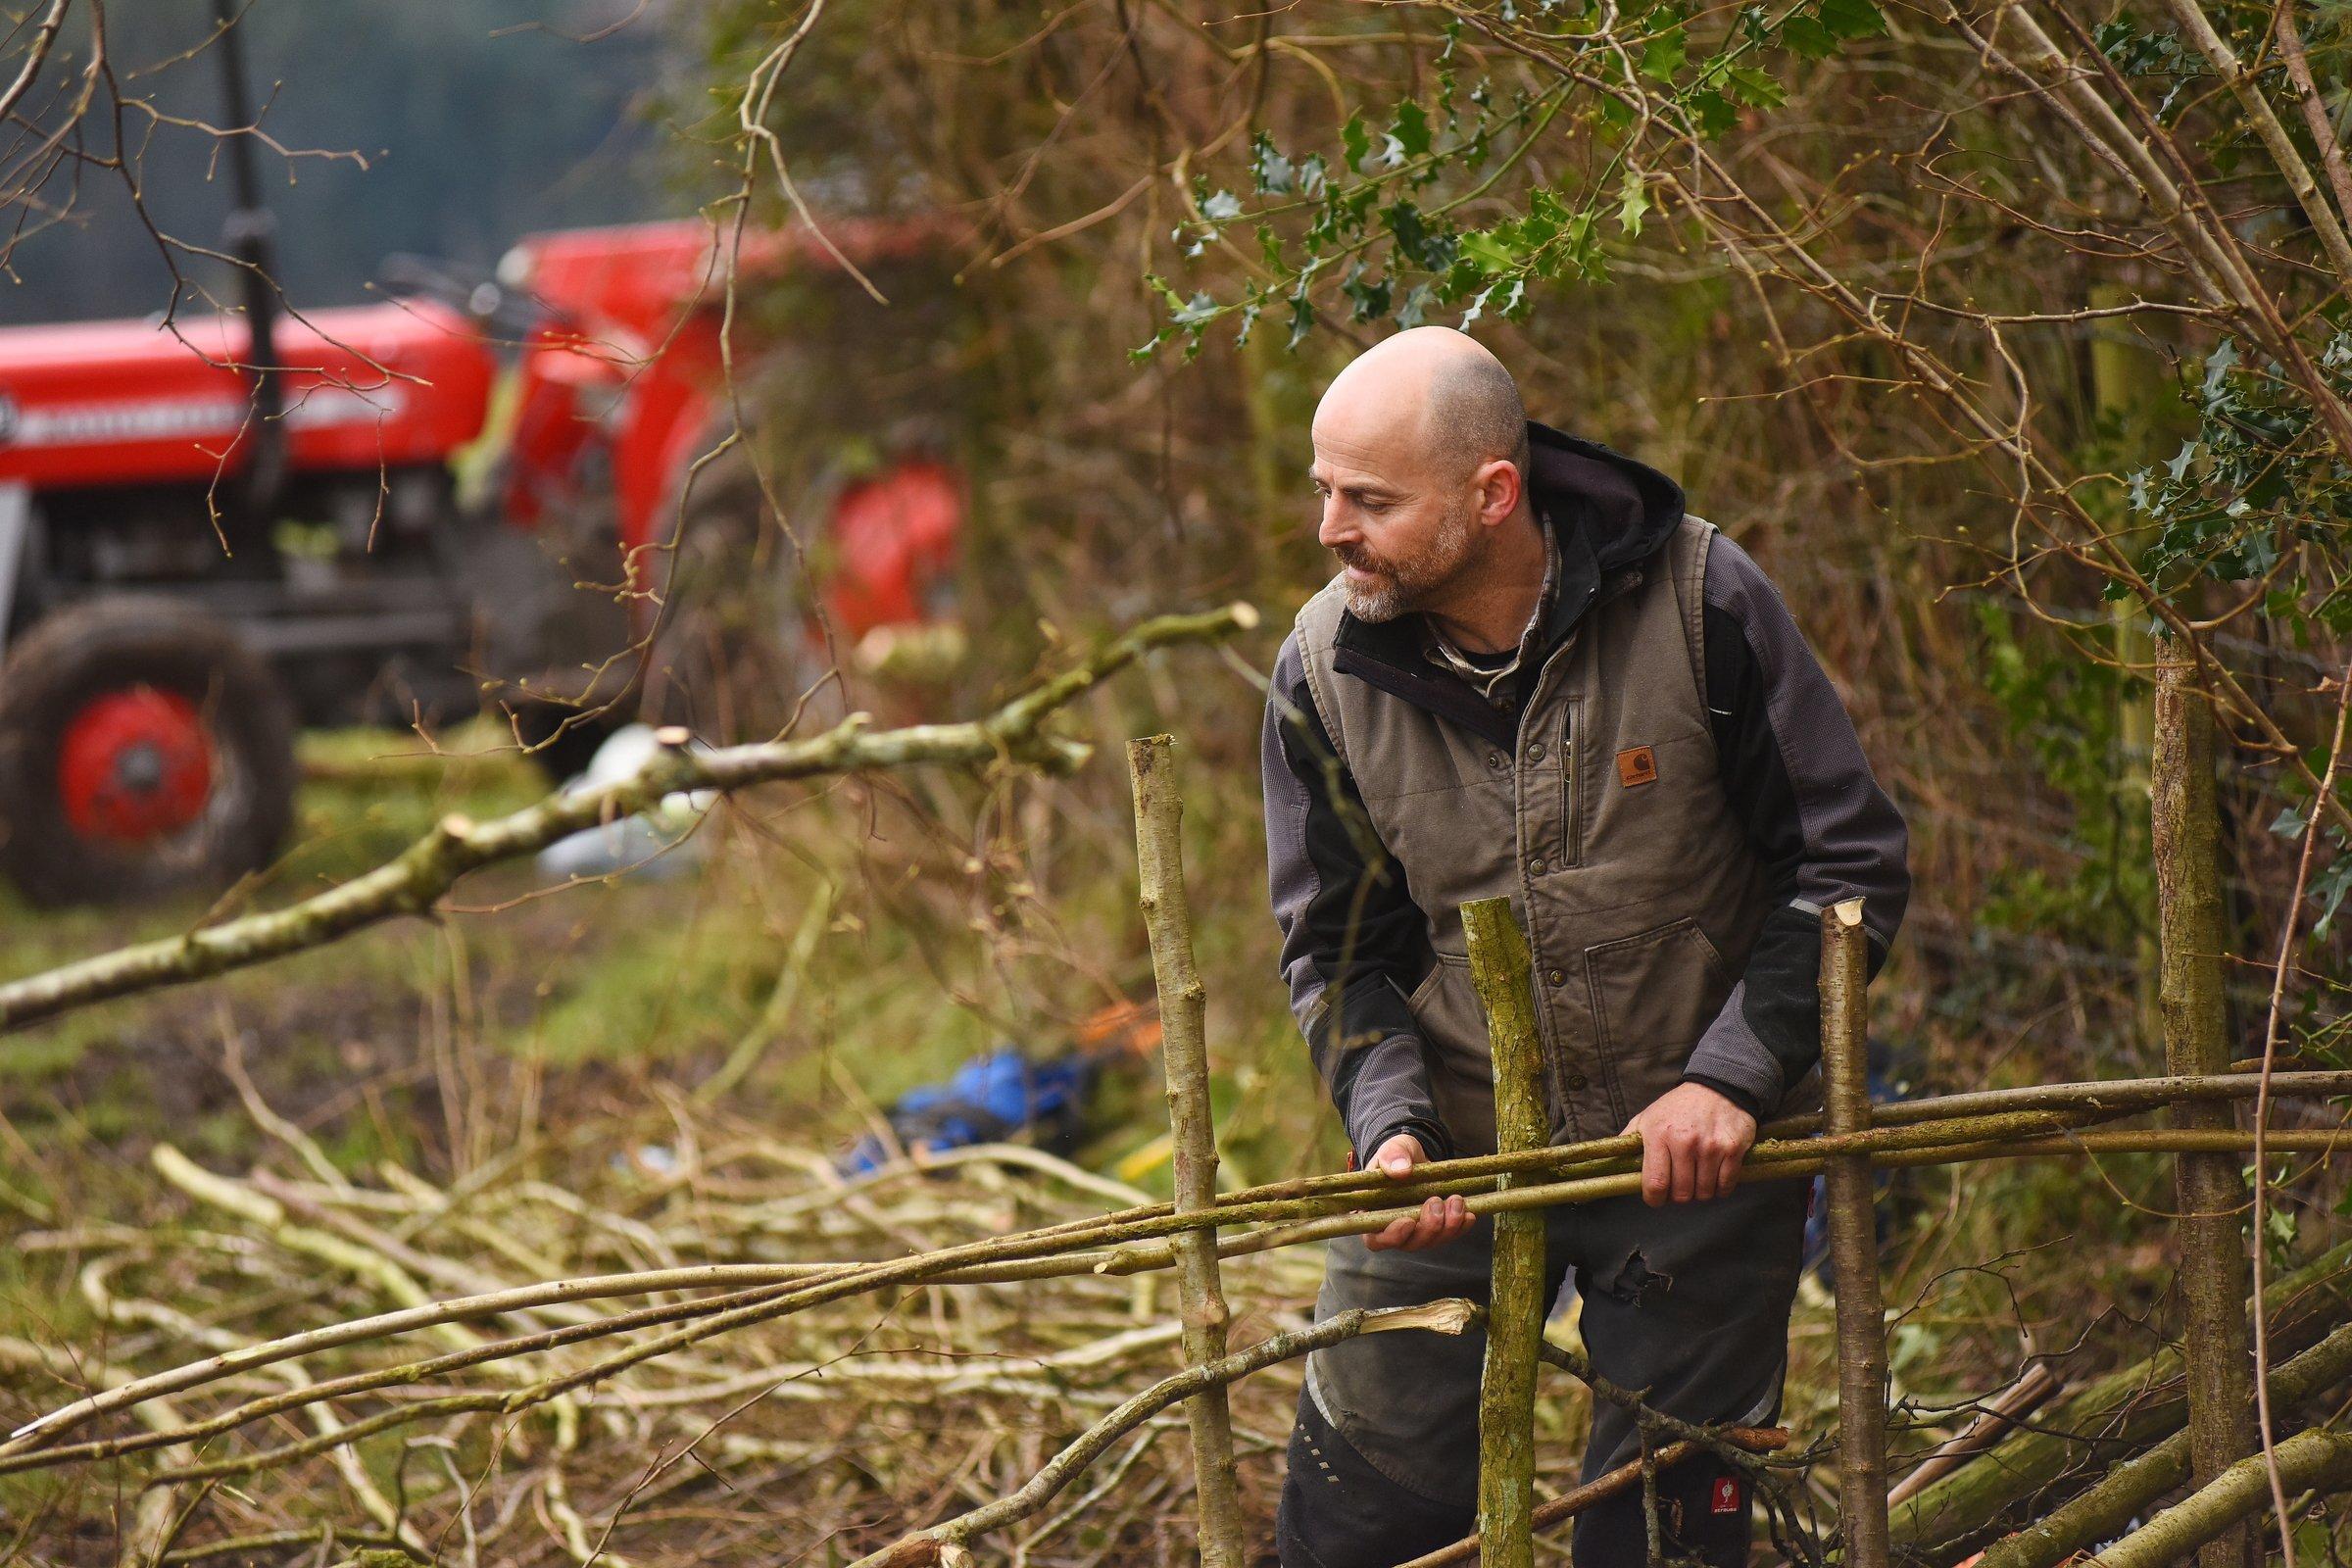 Professional hedgelayer Andrew Birnie